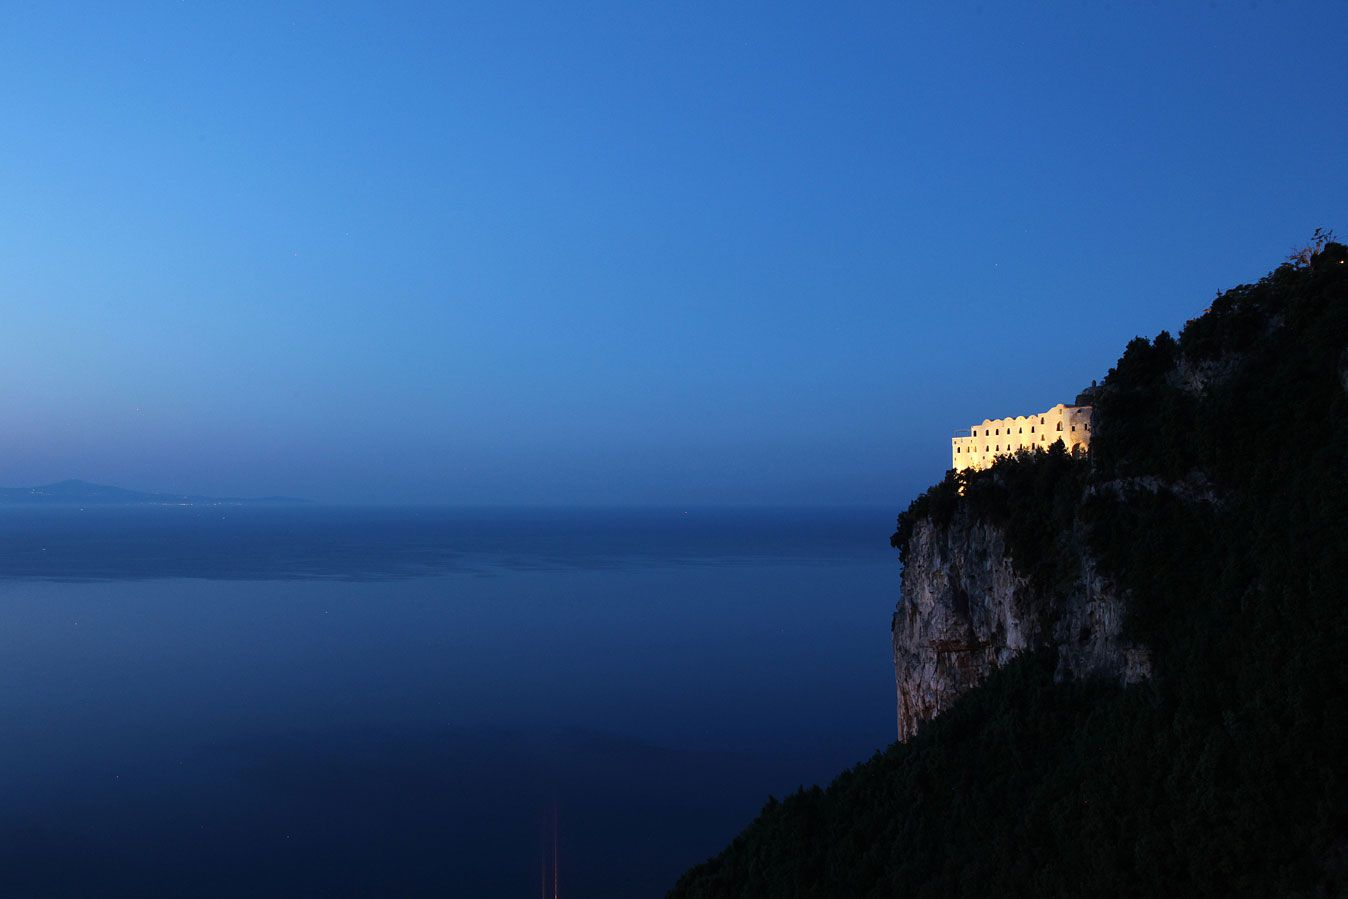 Monastero Santa Rosa | Luxury Resort & SPA | Amalfi Coast | Italy | Amalfi Hotel | monasterosantarosa